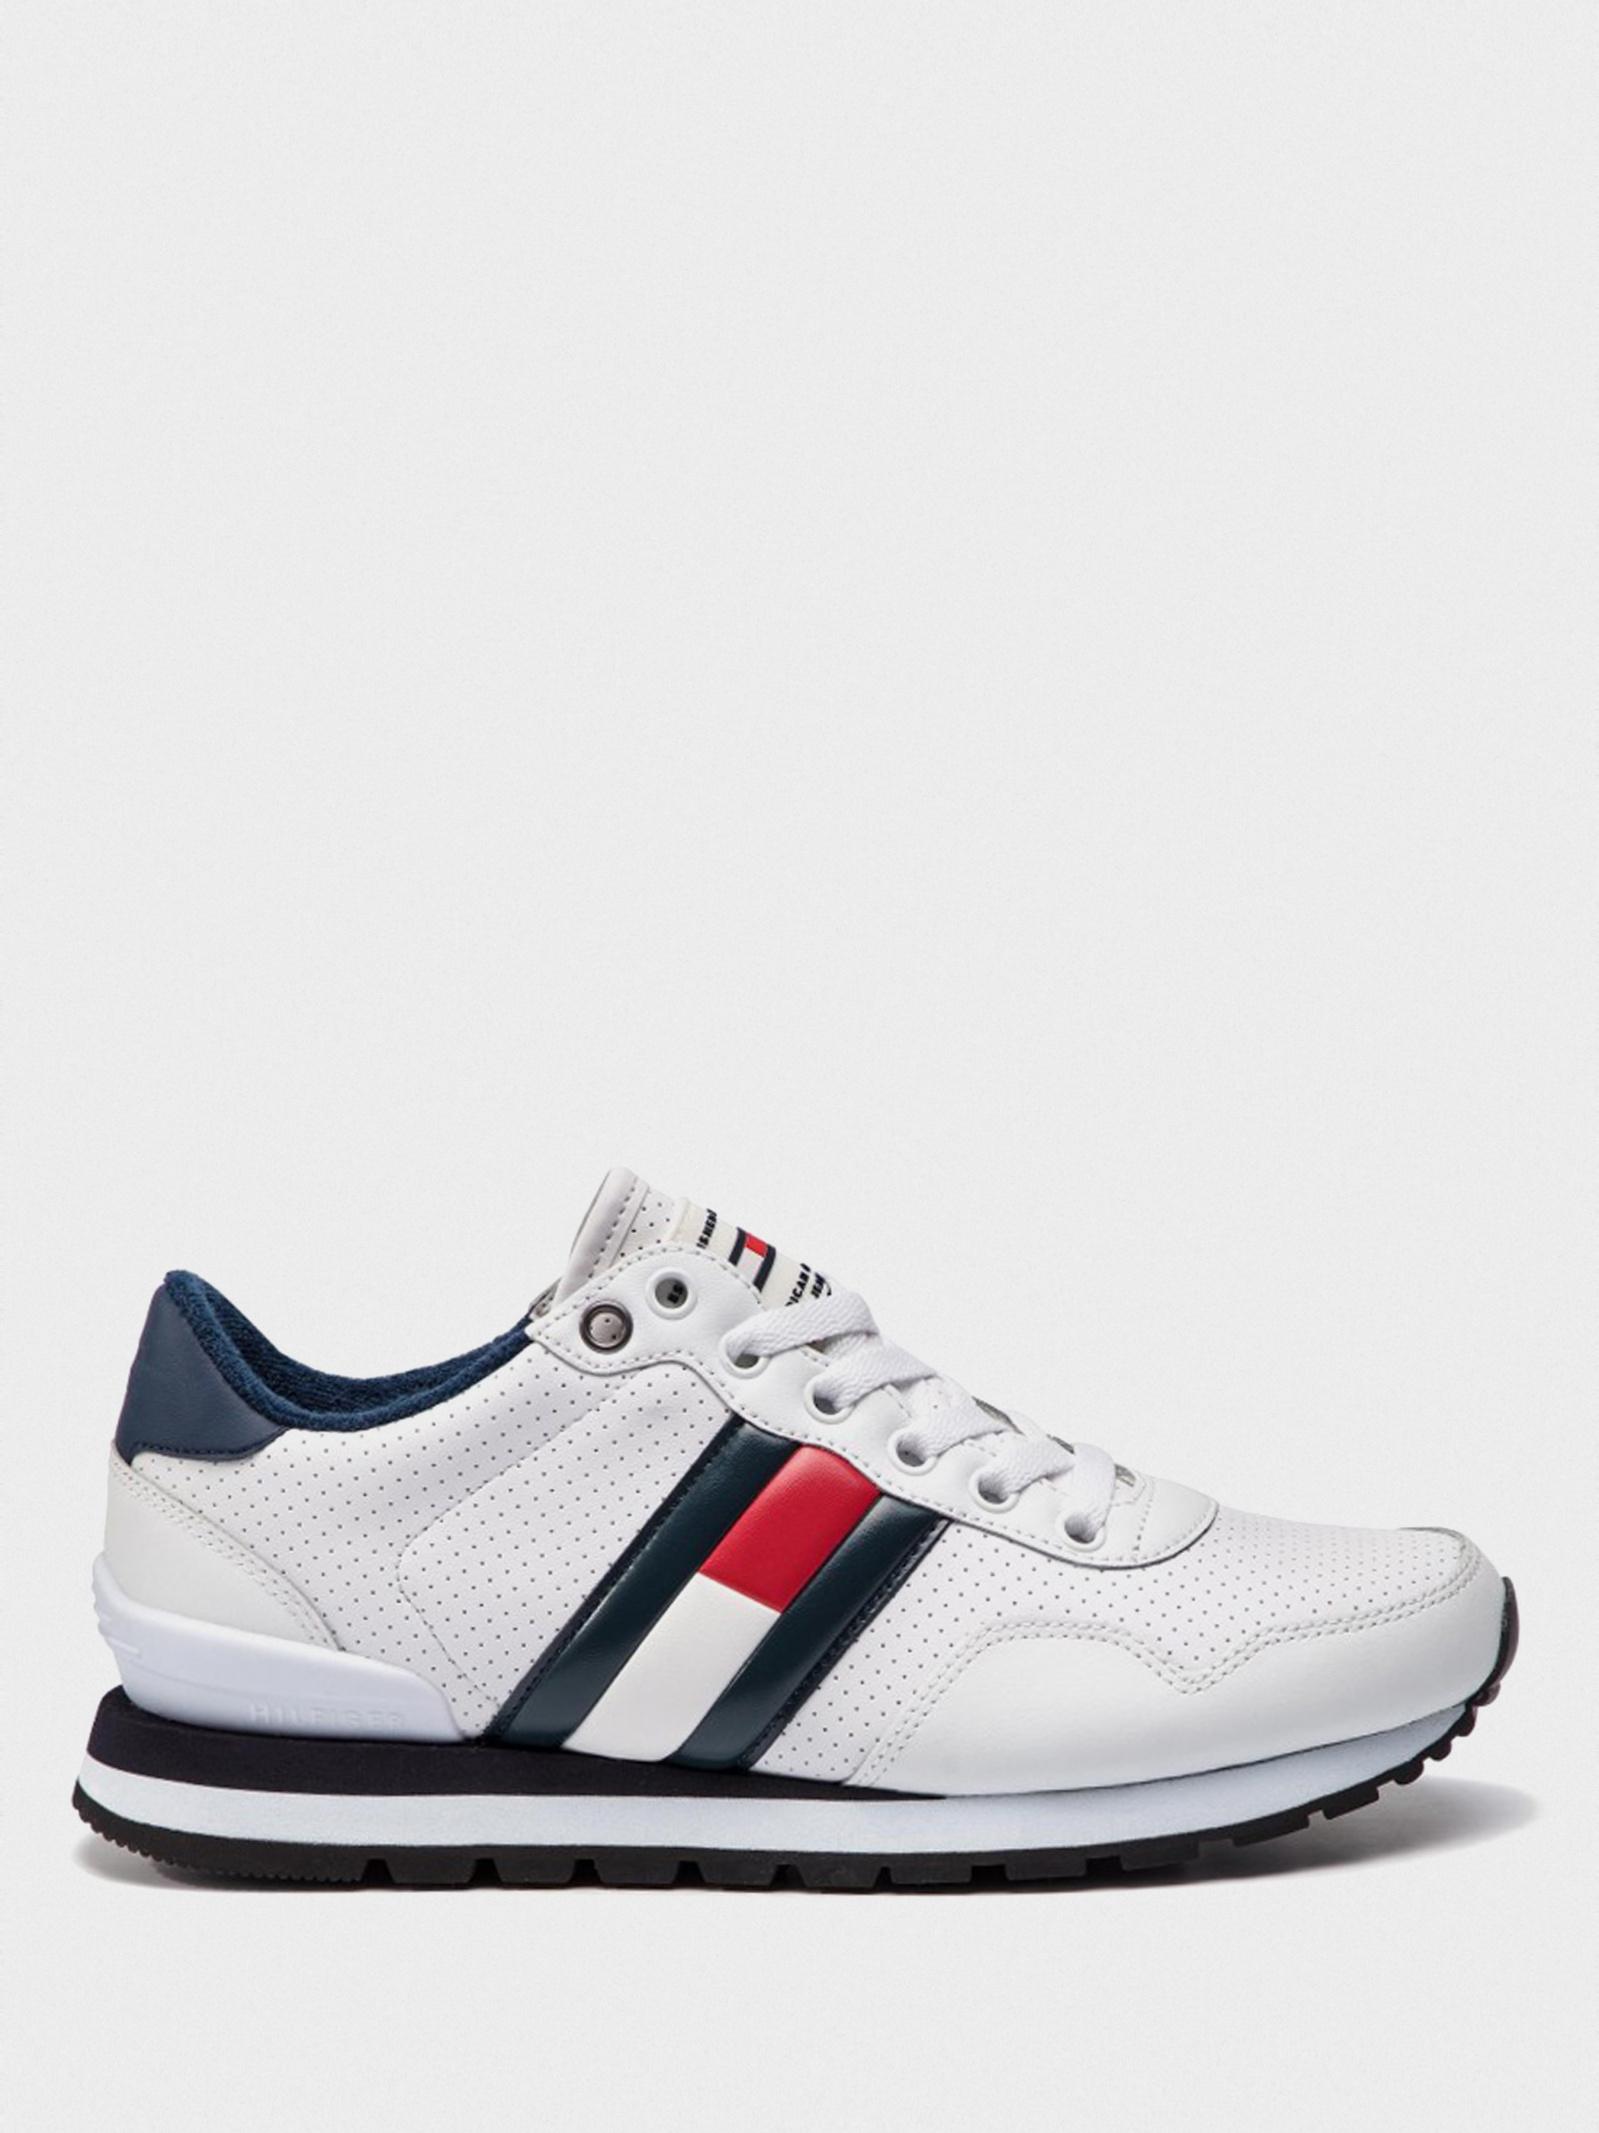 Кроссовки для мужчин Tommy Hilfiger LIFESTYLE TOMMY JEANS SNEAKER EM0EM00263-100 купить онлайн, 2017